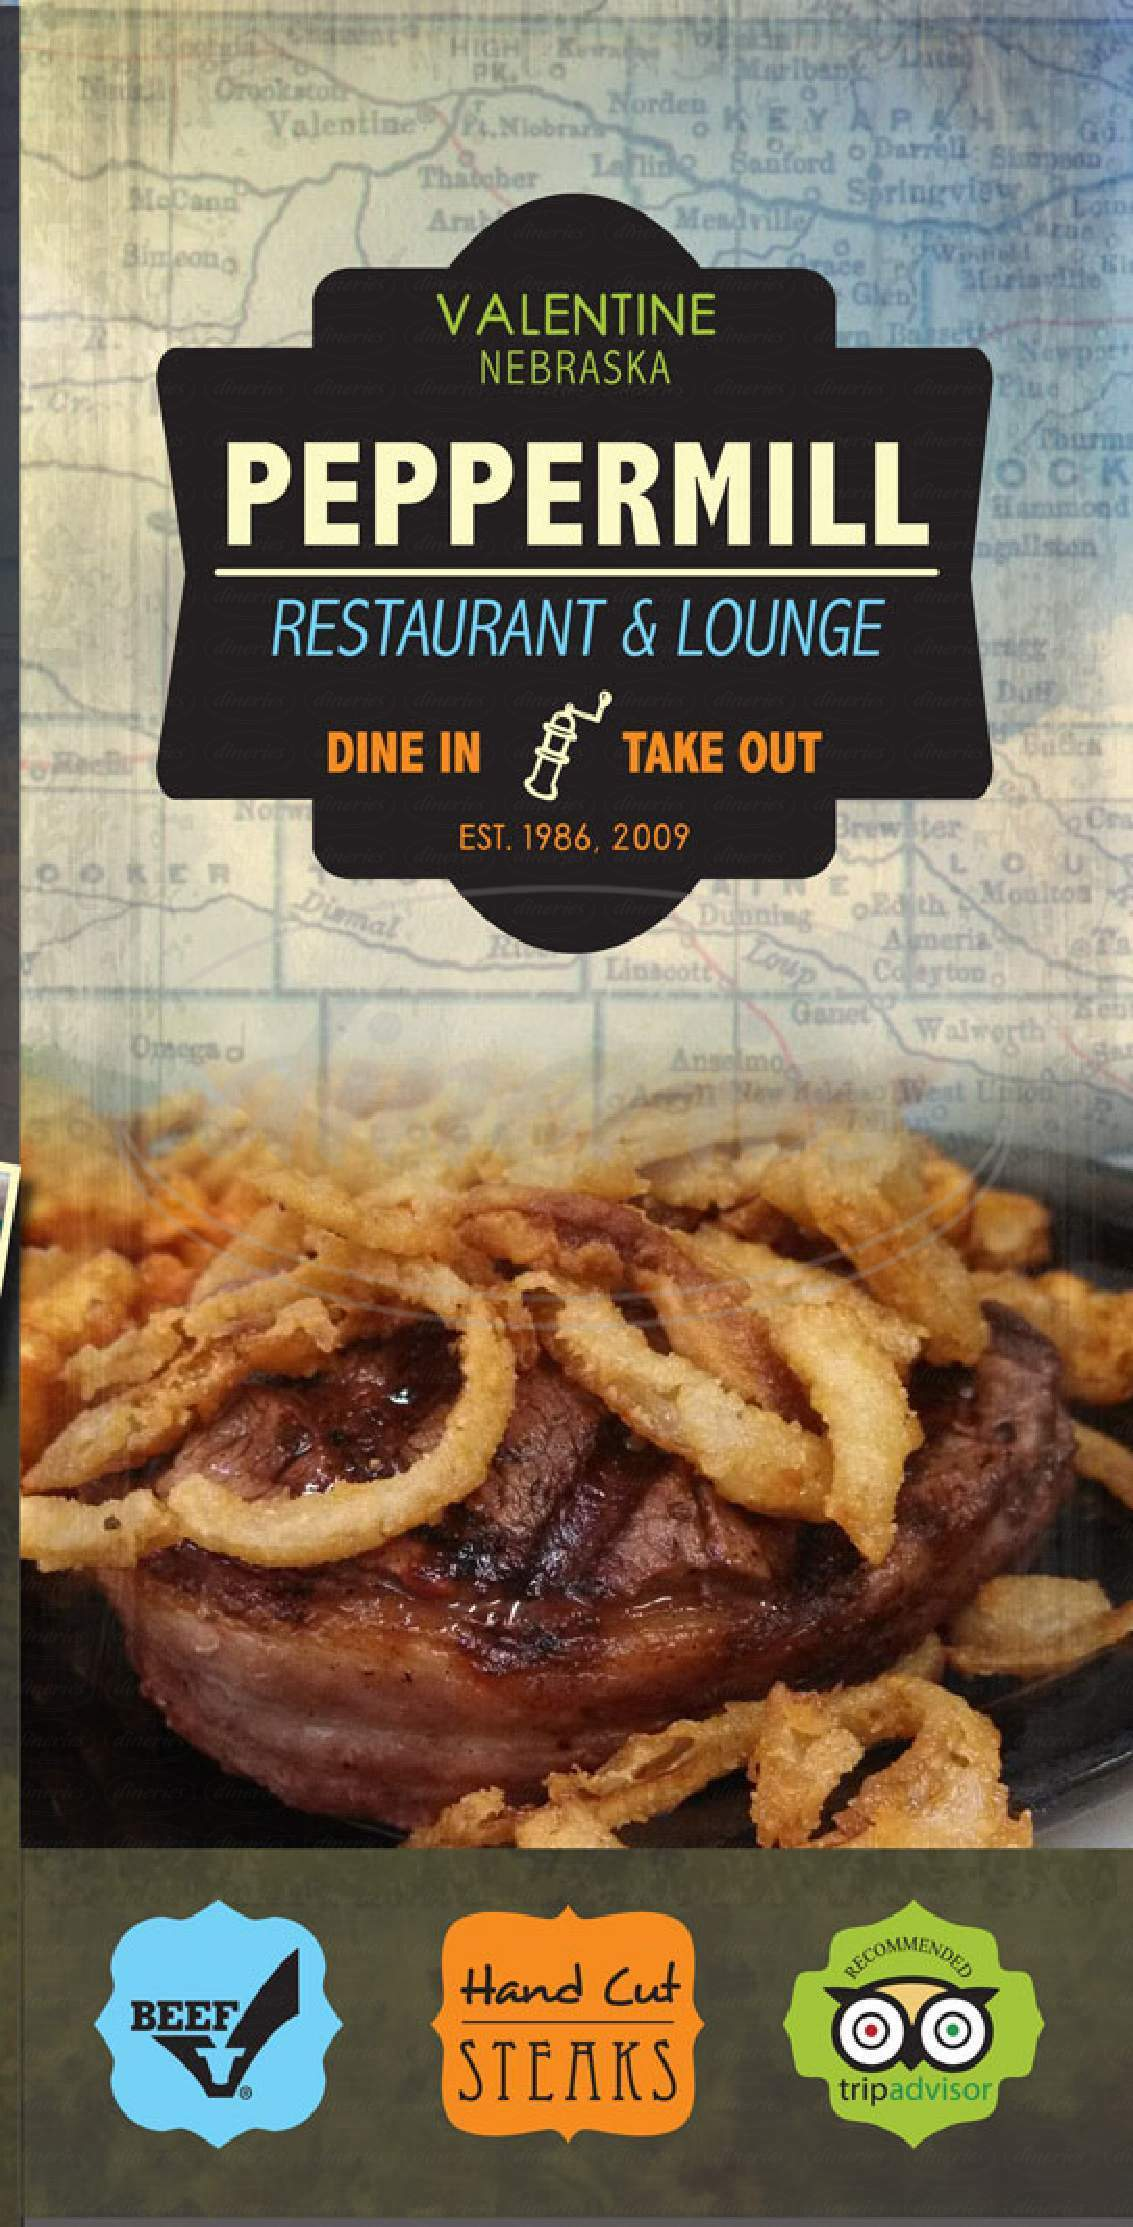 menu for Peppermill & E.K. Valentine Lounge